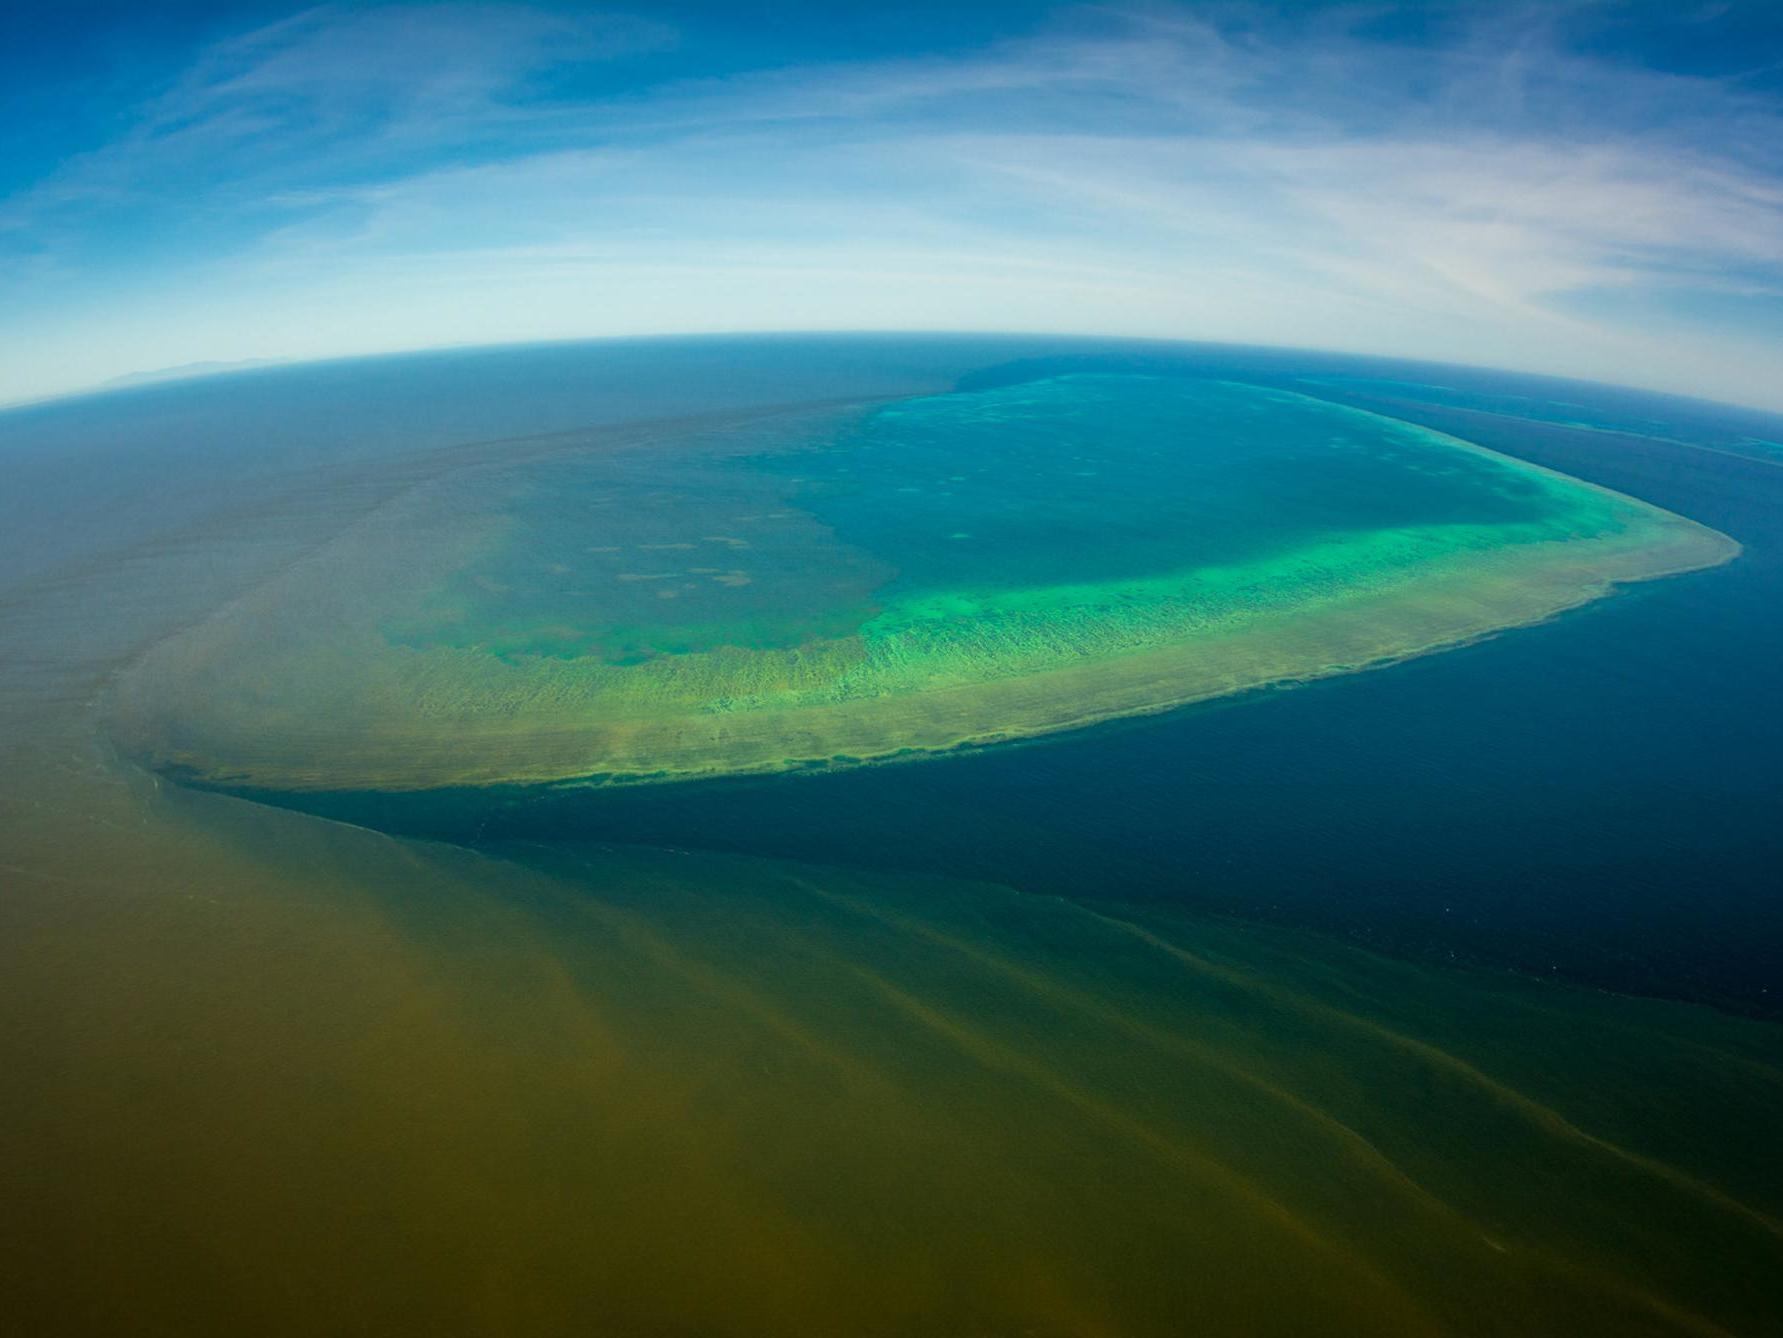 Australia approves dumping of 1 million tonnes of sludge near Great Barrier Reef